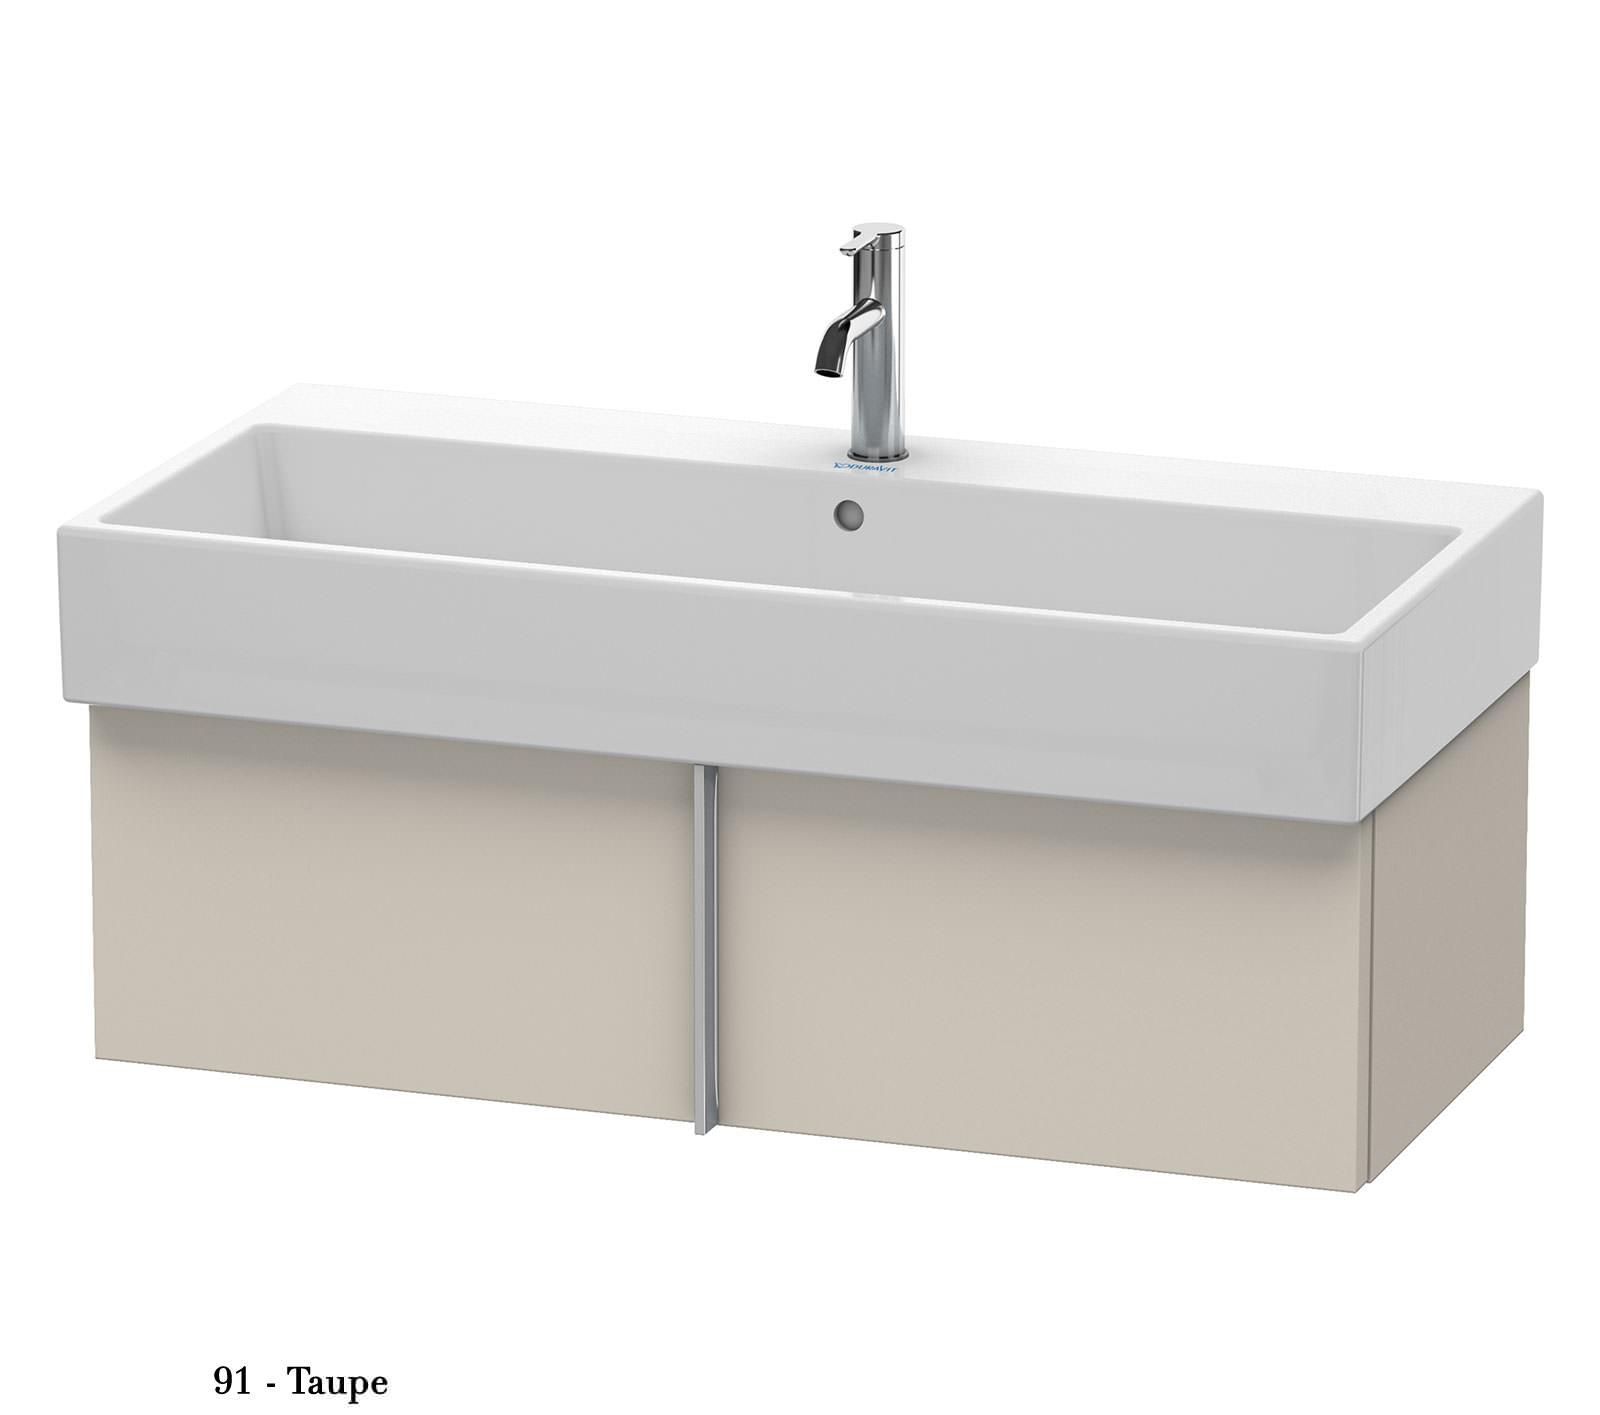 duravit vero air 984 x 431mm 1 pull out compartment unit. Black Bedroom Furniture Sets. Home Design Ideas